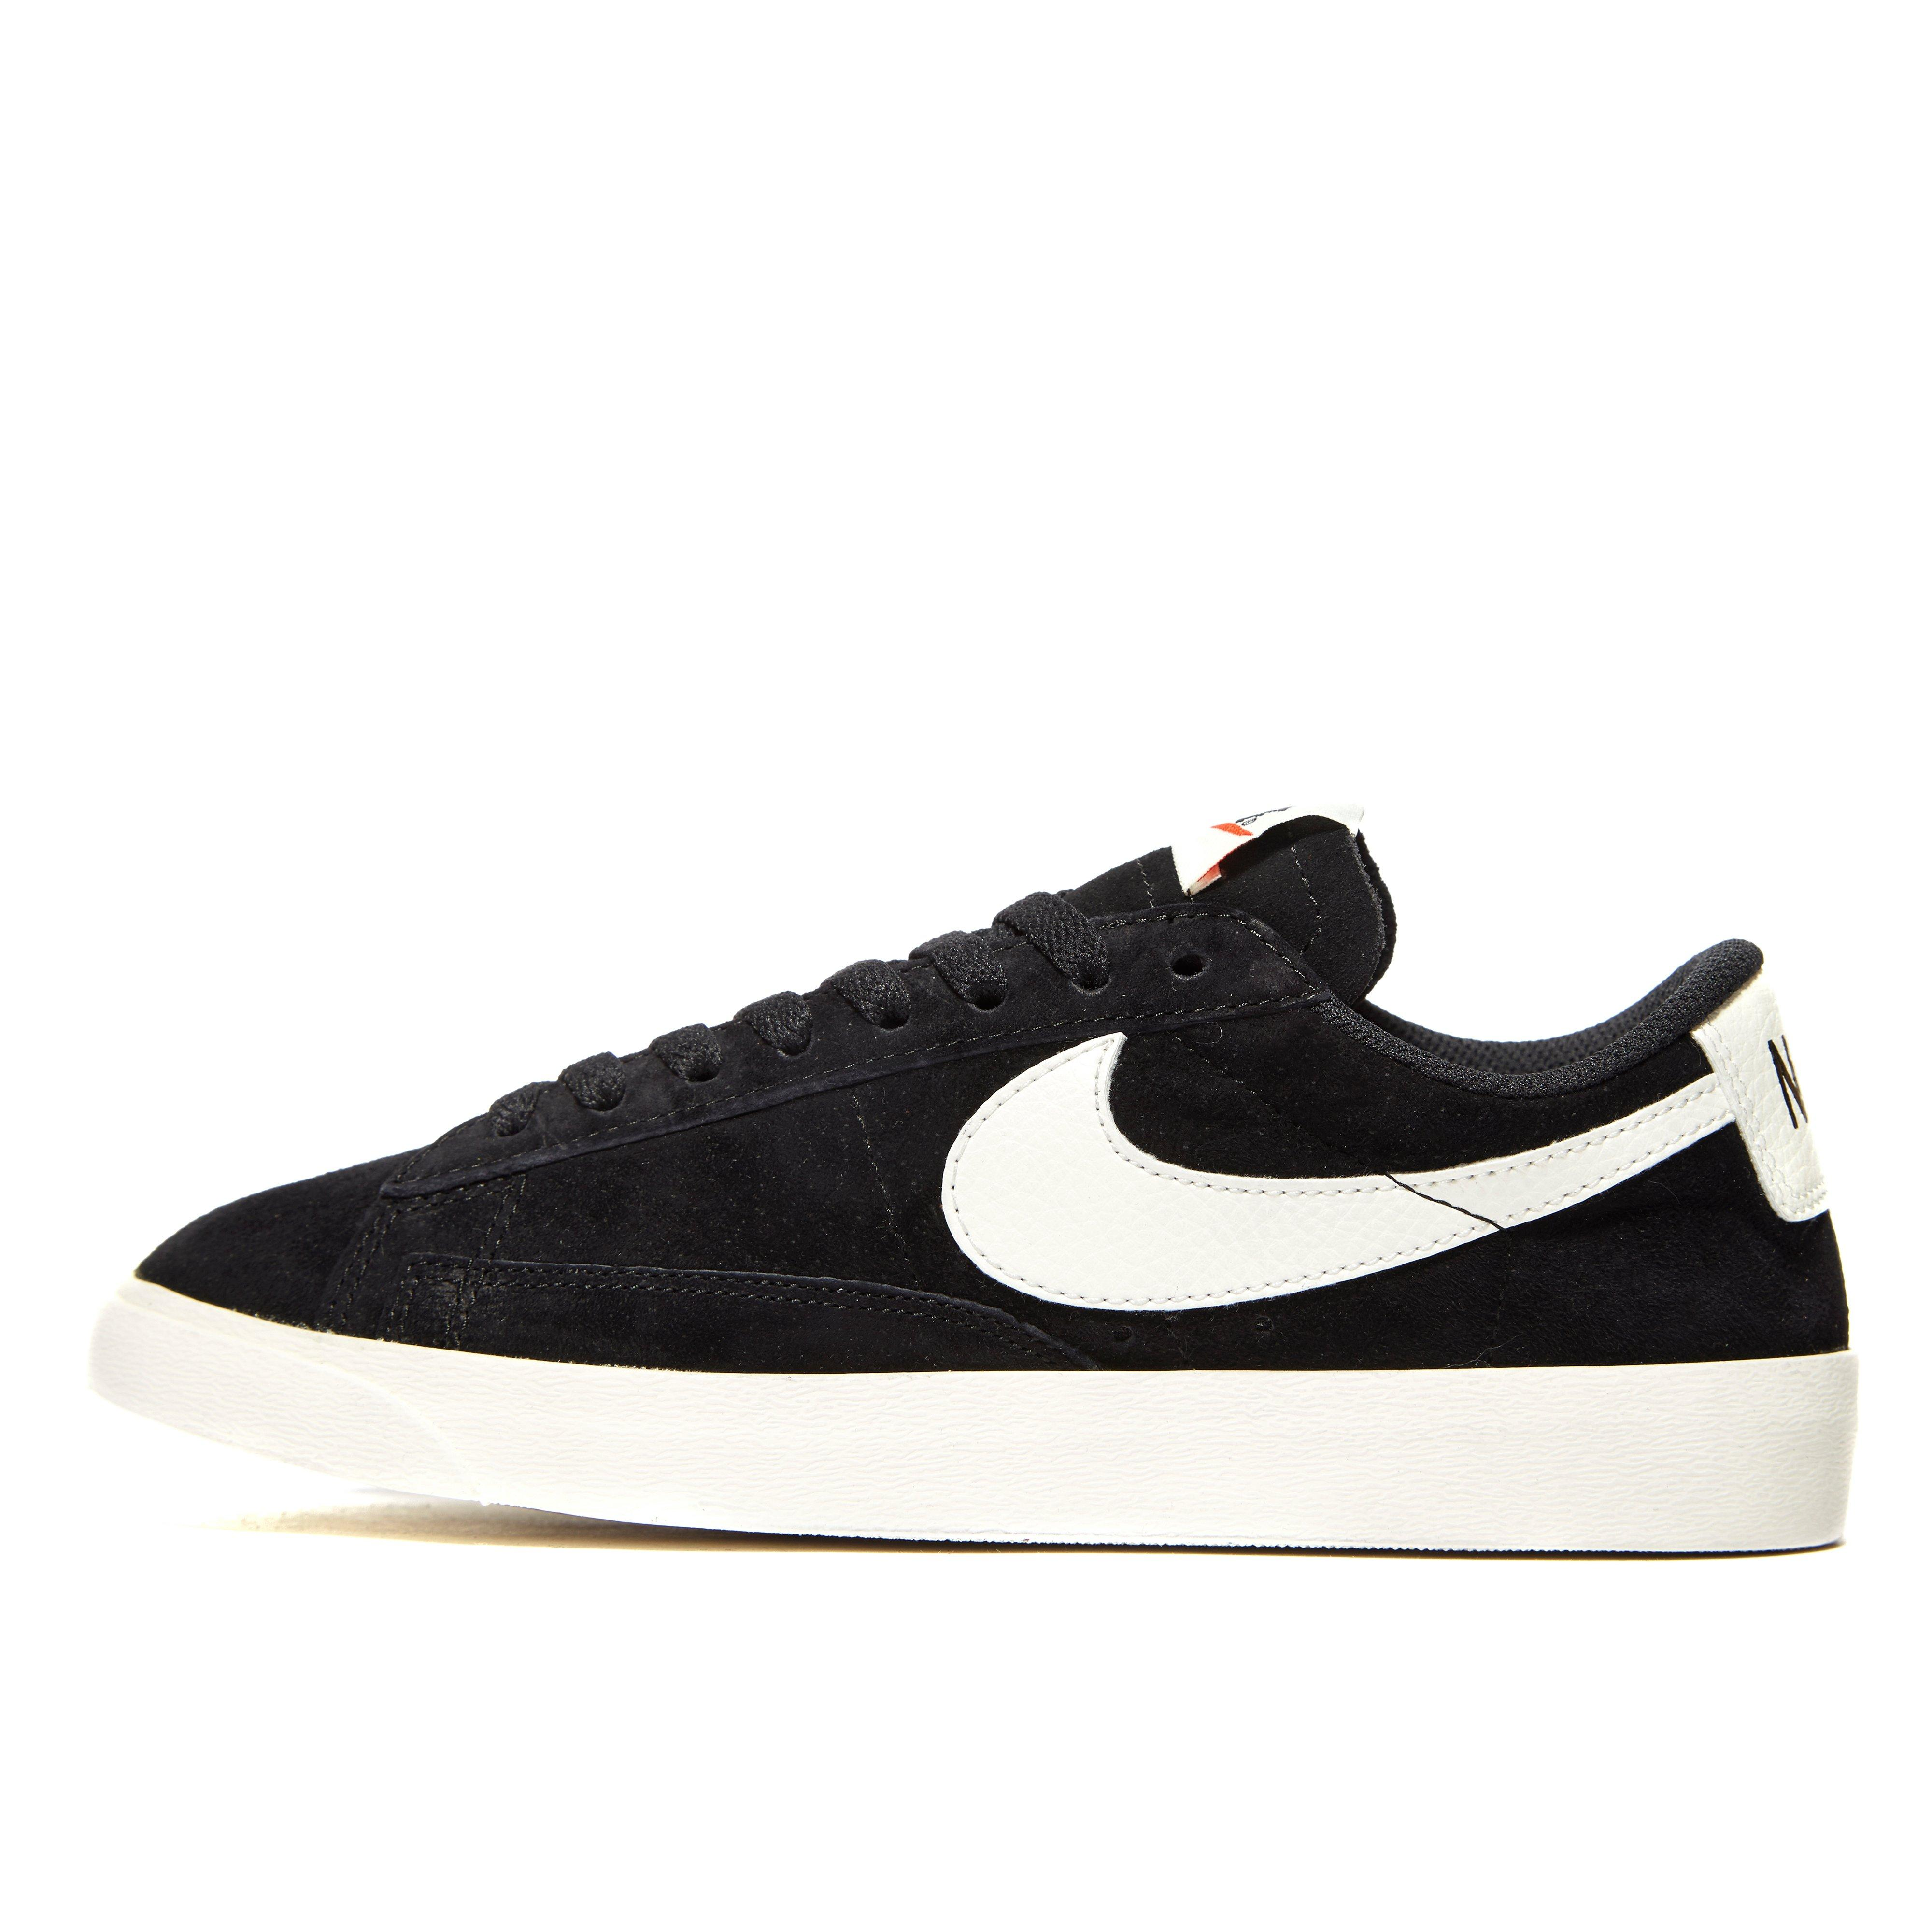 Nike Blazer Chaussures Basses En Daim